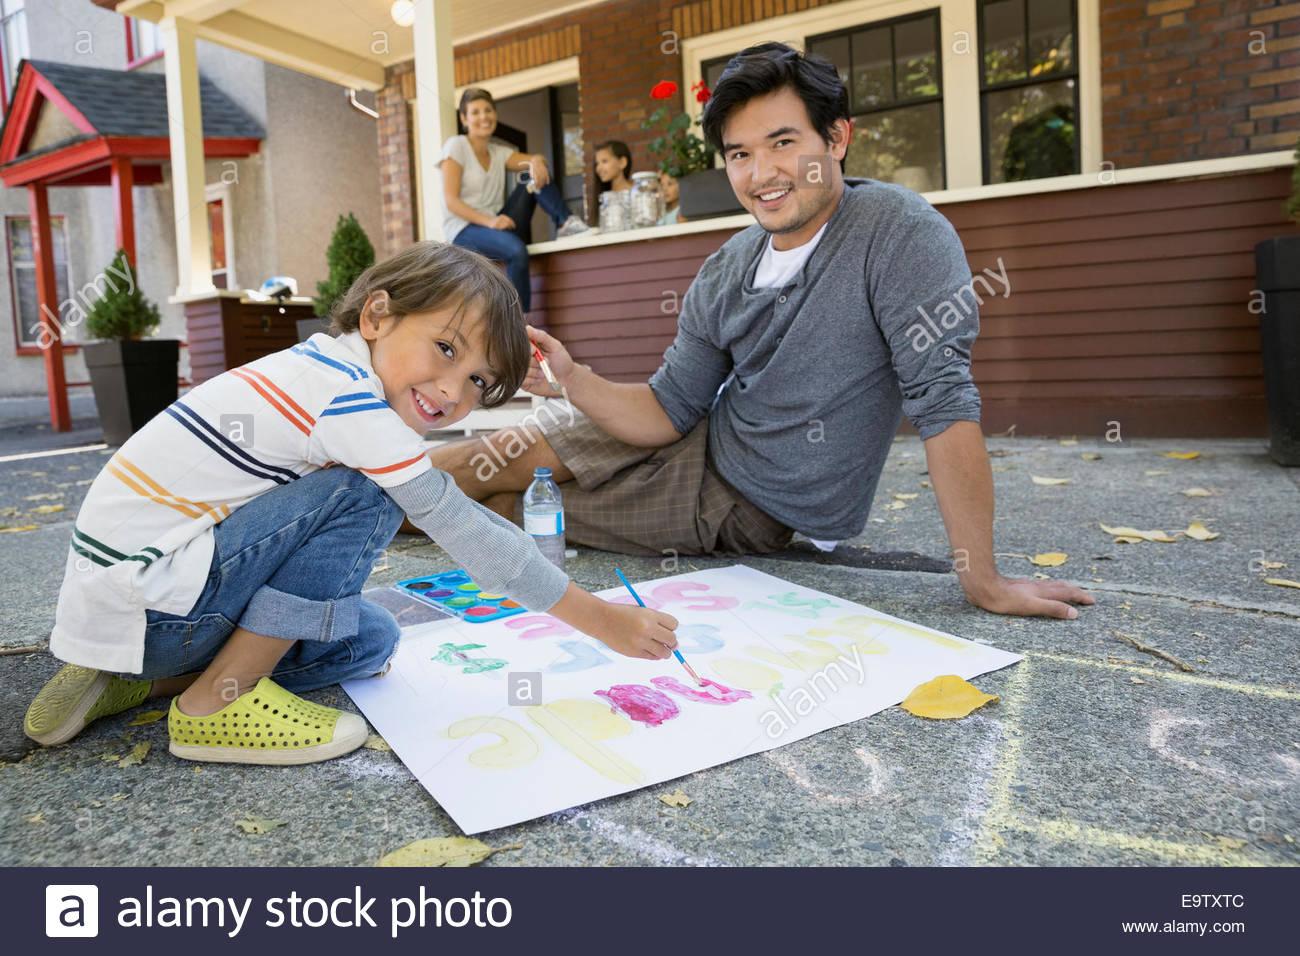 Padre e hijo pintura Lemonade Stand signo Imagen De Stock